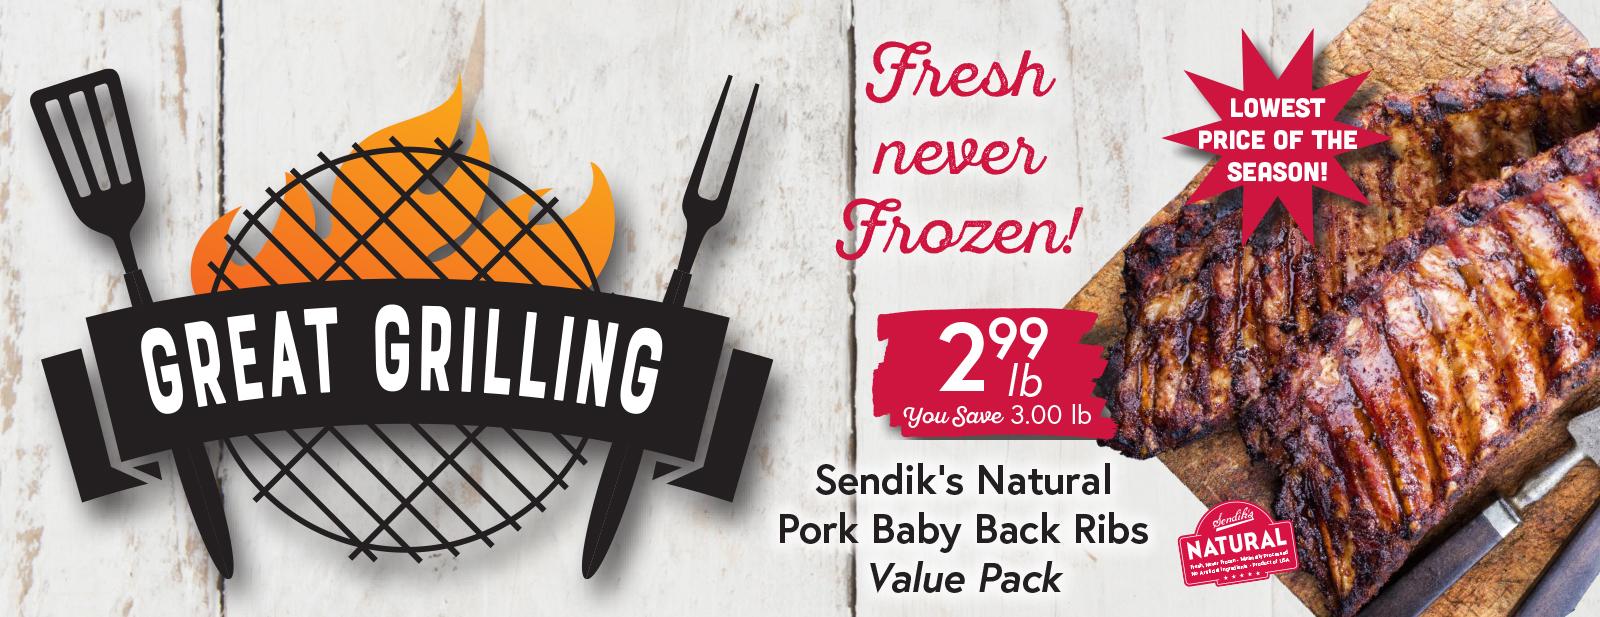 Sendik's Natural Pork Baby Back Ribs $2.99 lb